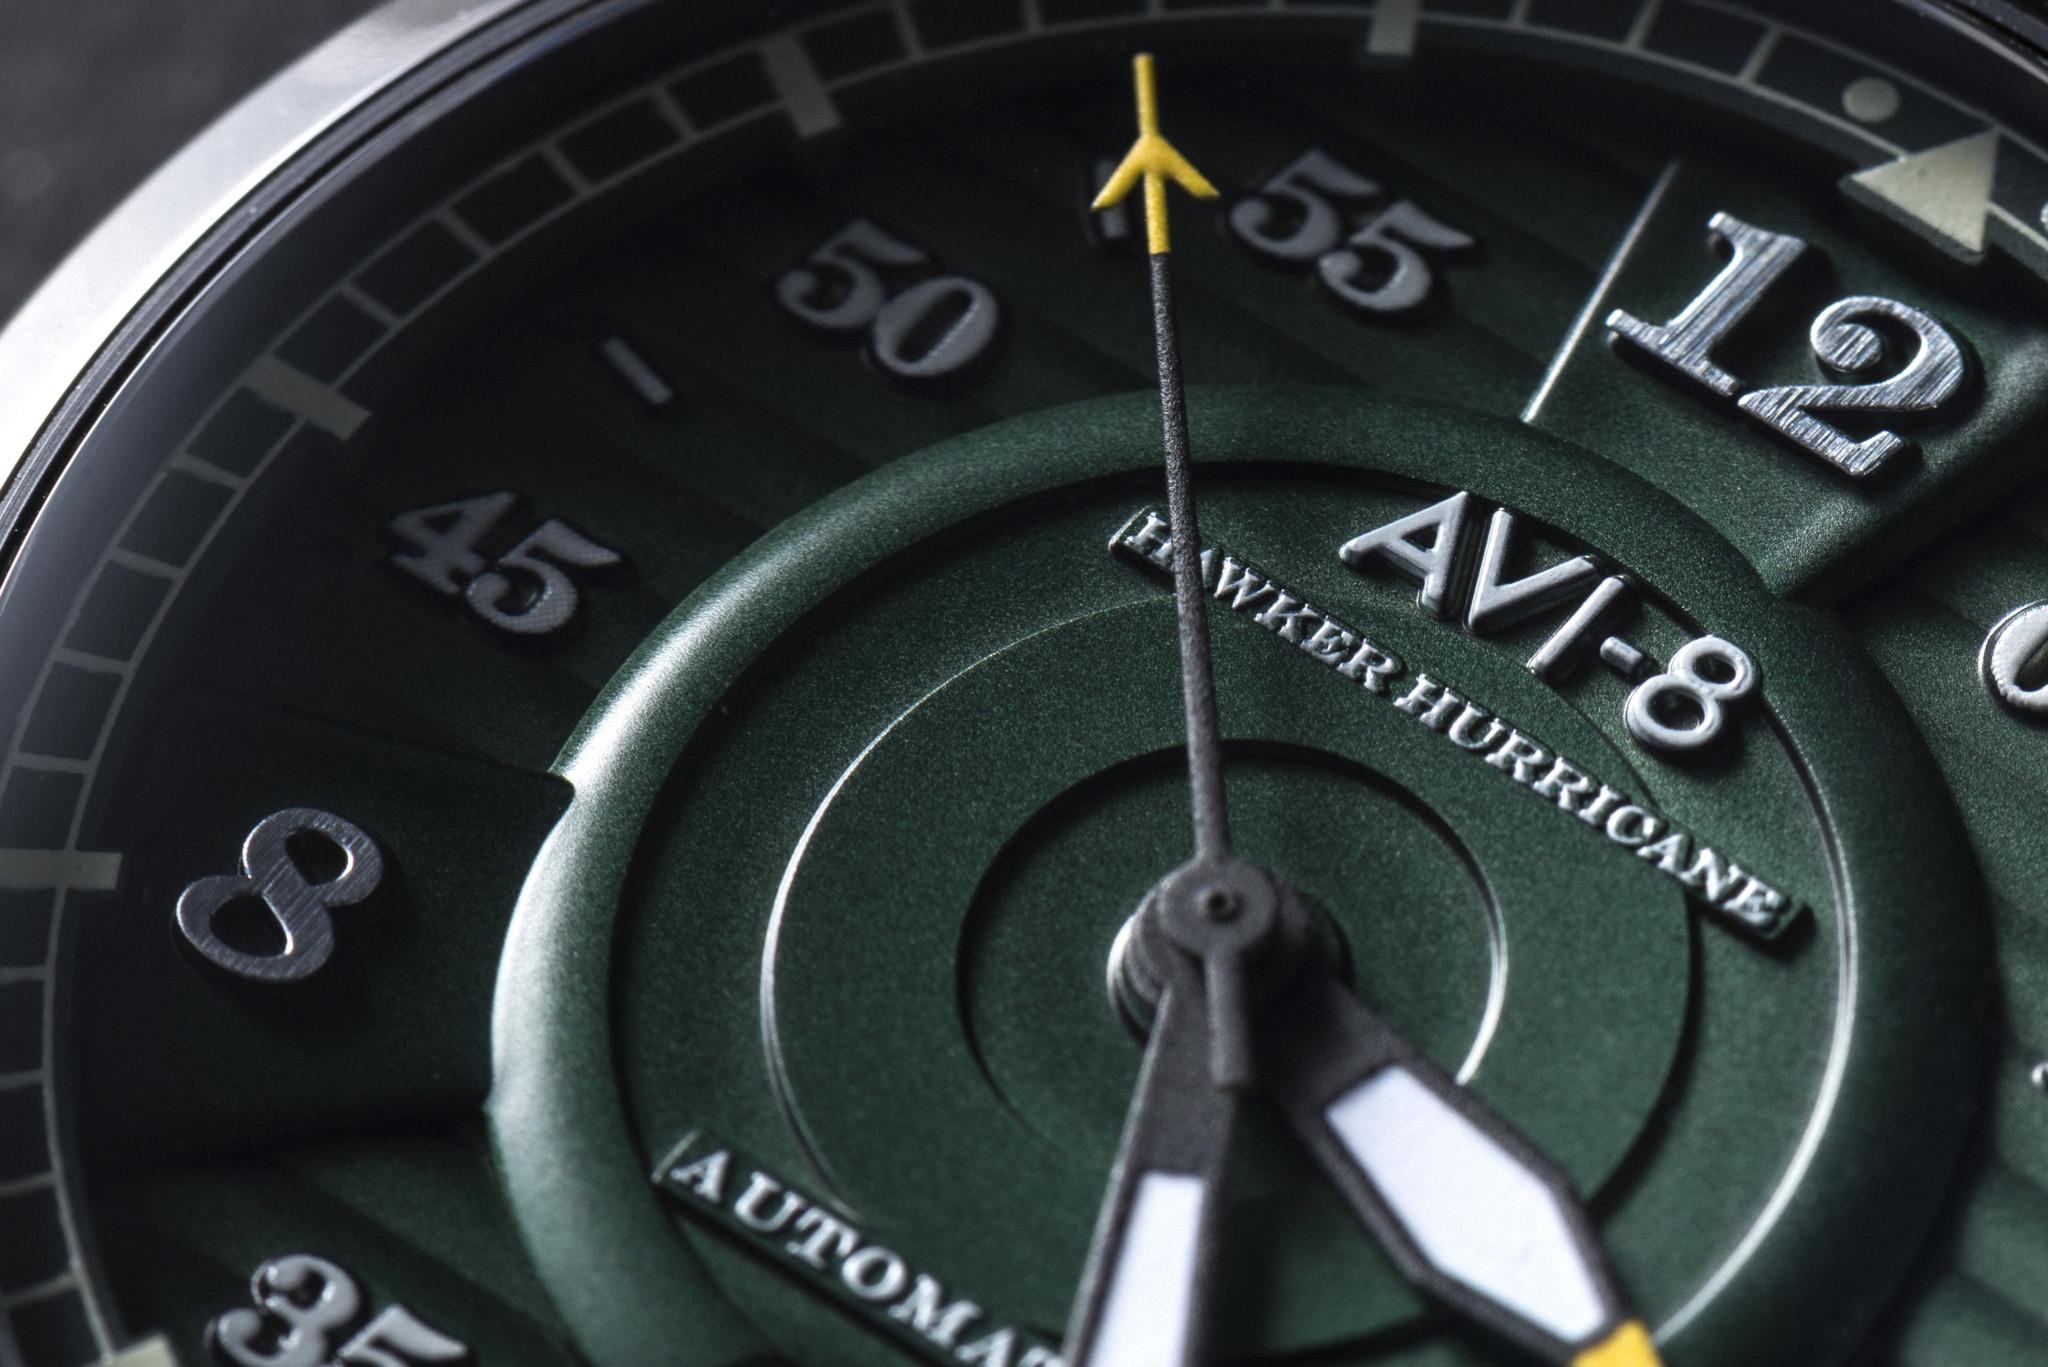 AV-4046-04 MS01